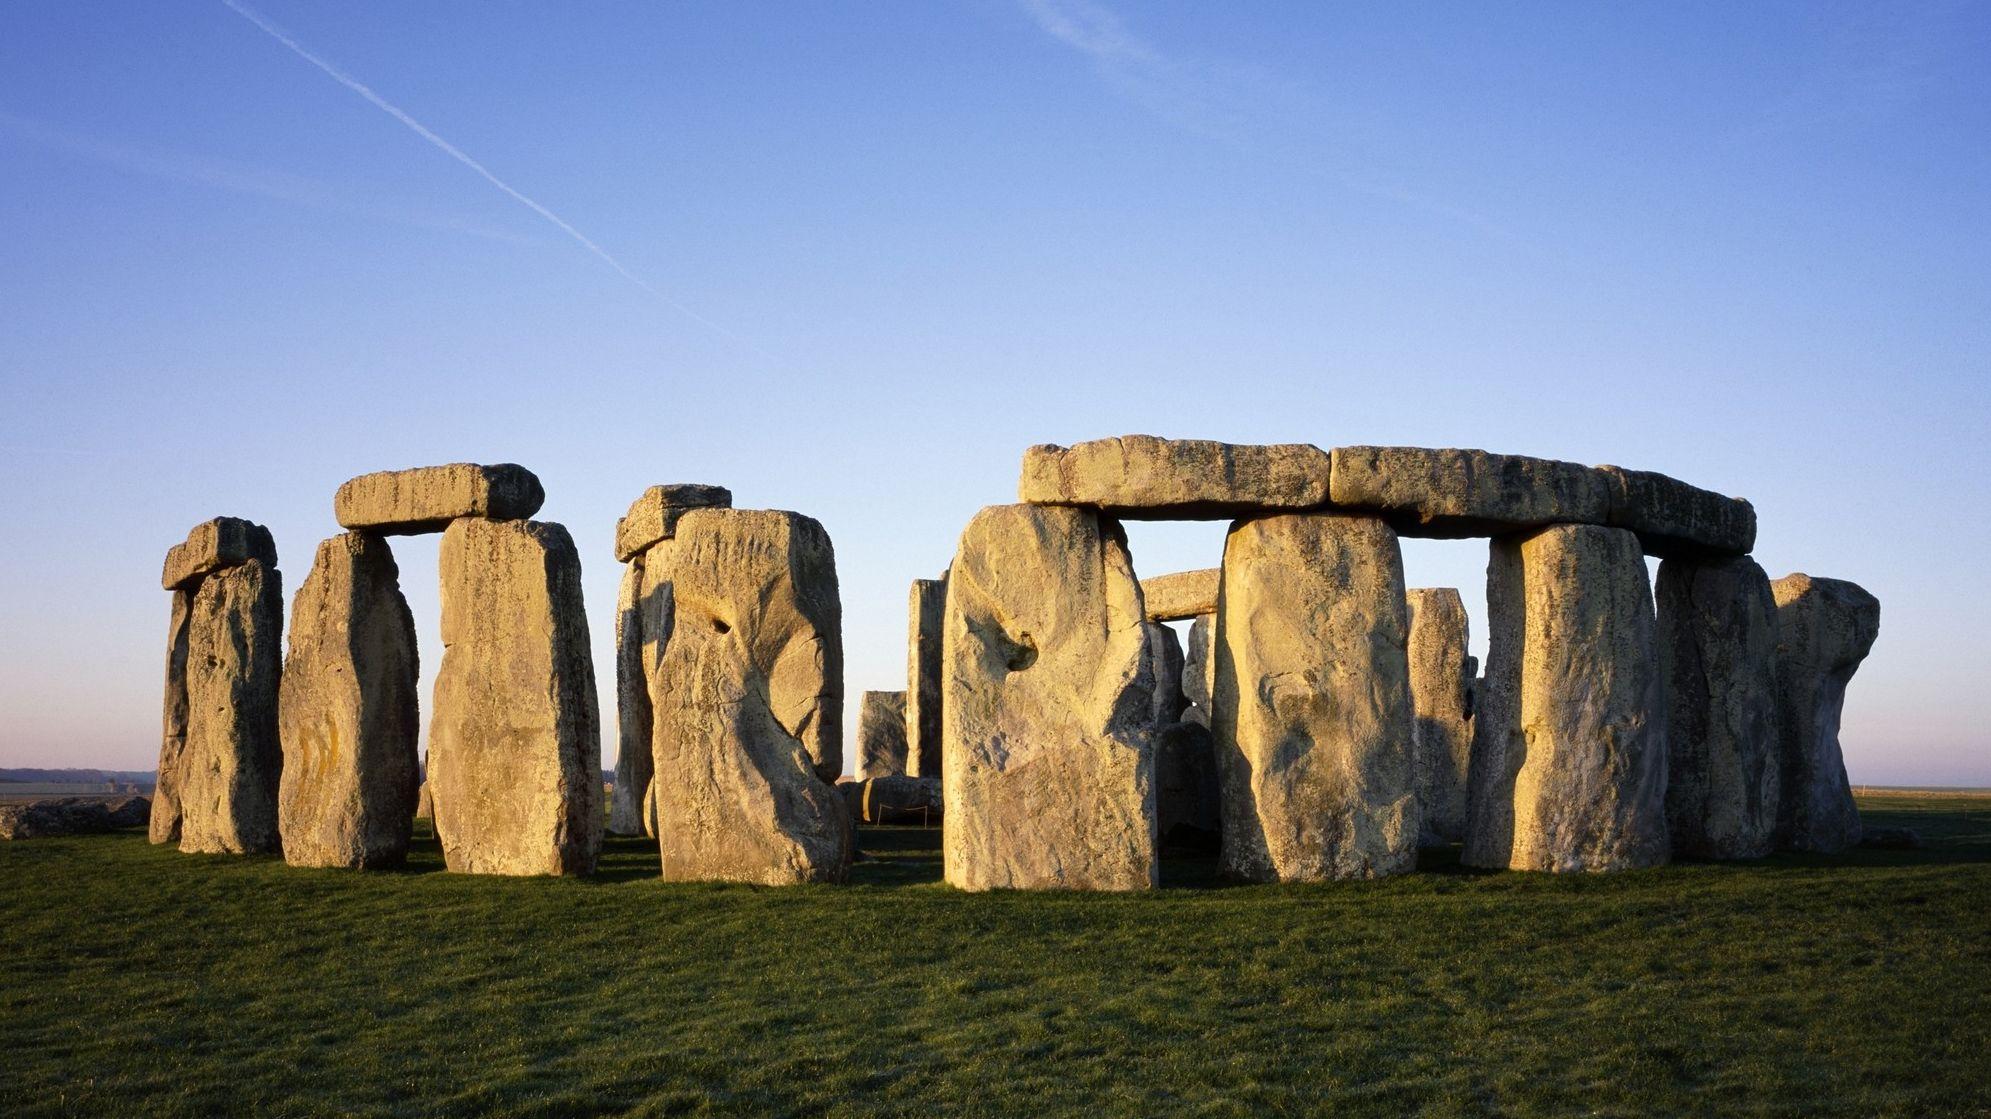 Exterior image of Stonehenge